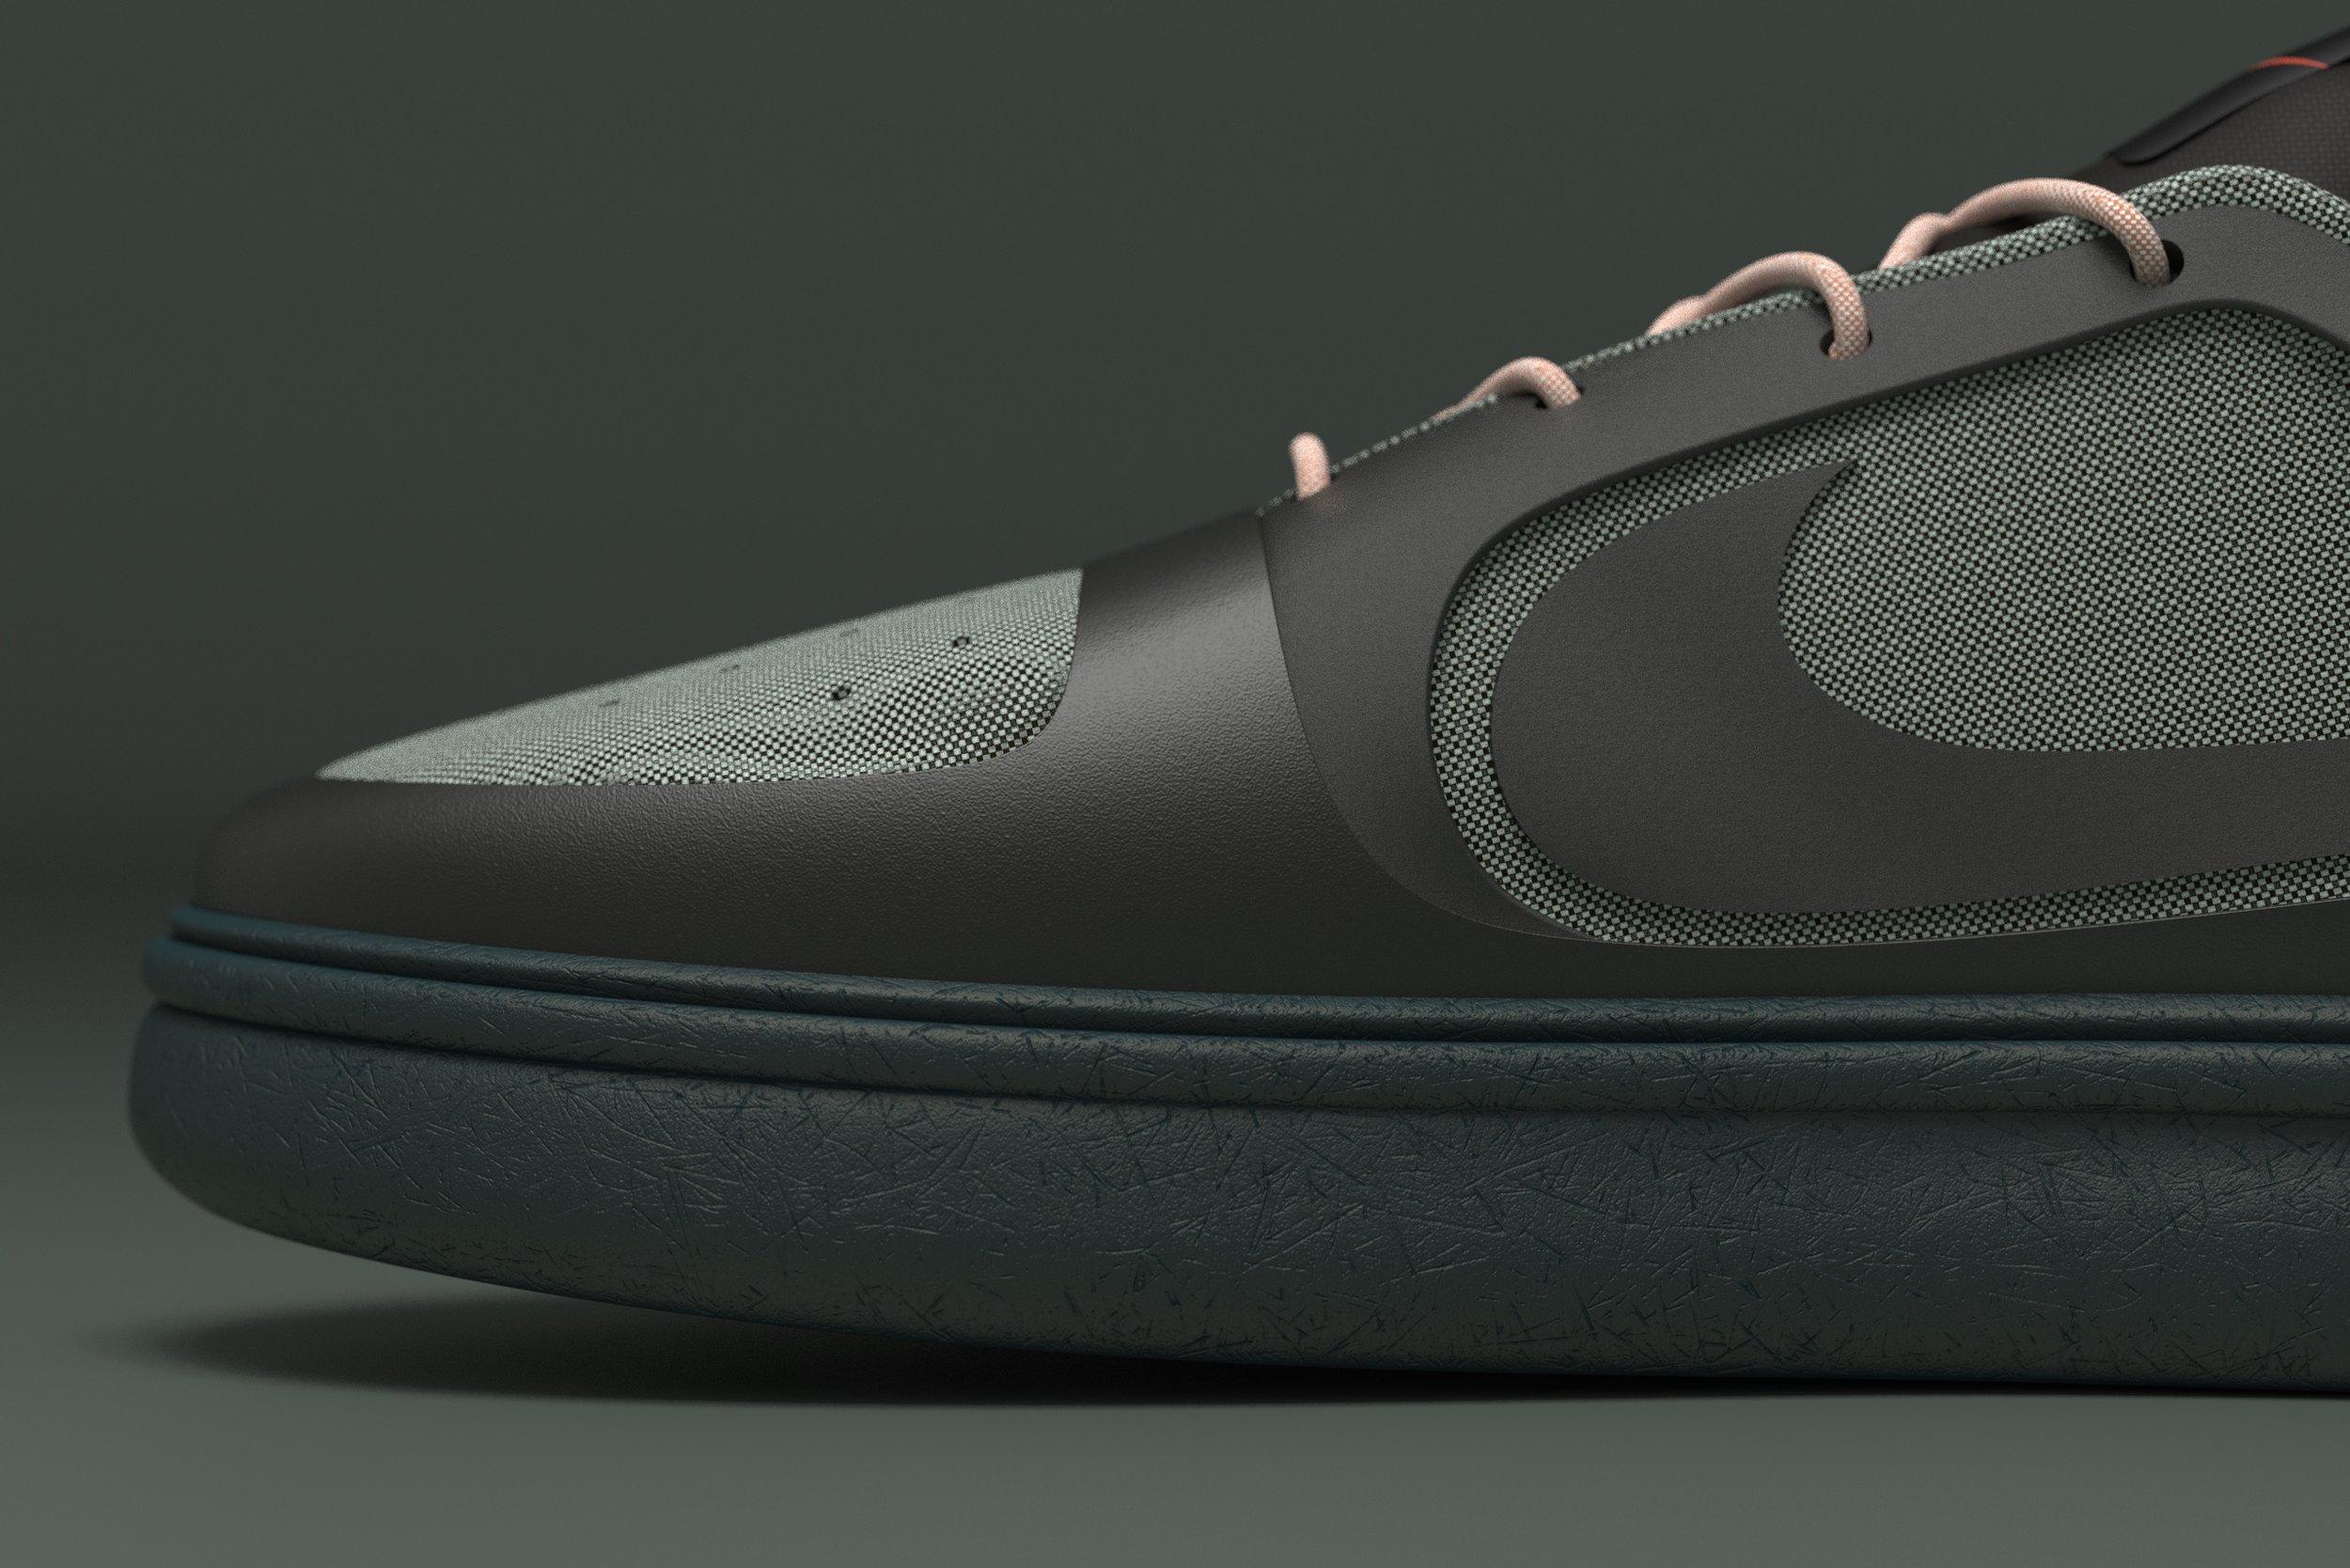 Shoe OFFSET COLOR WAY.18.jpg